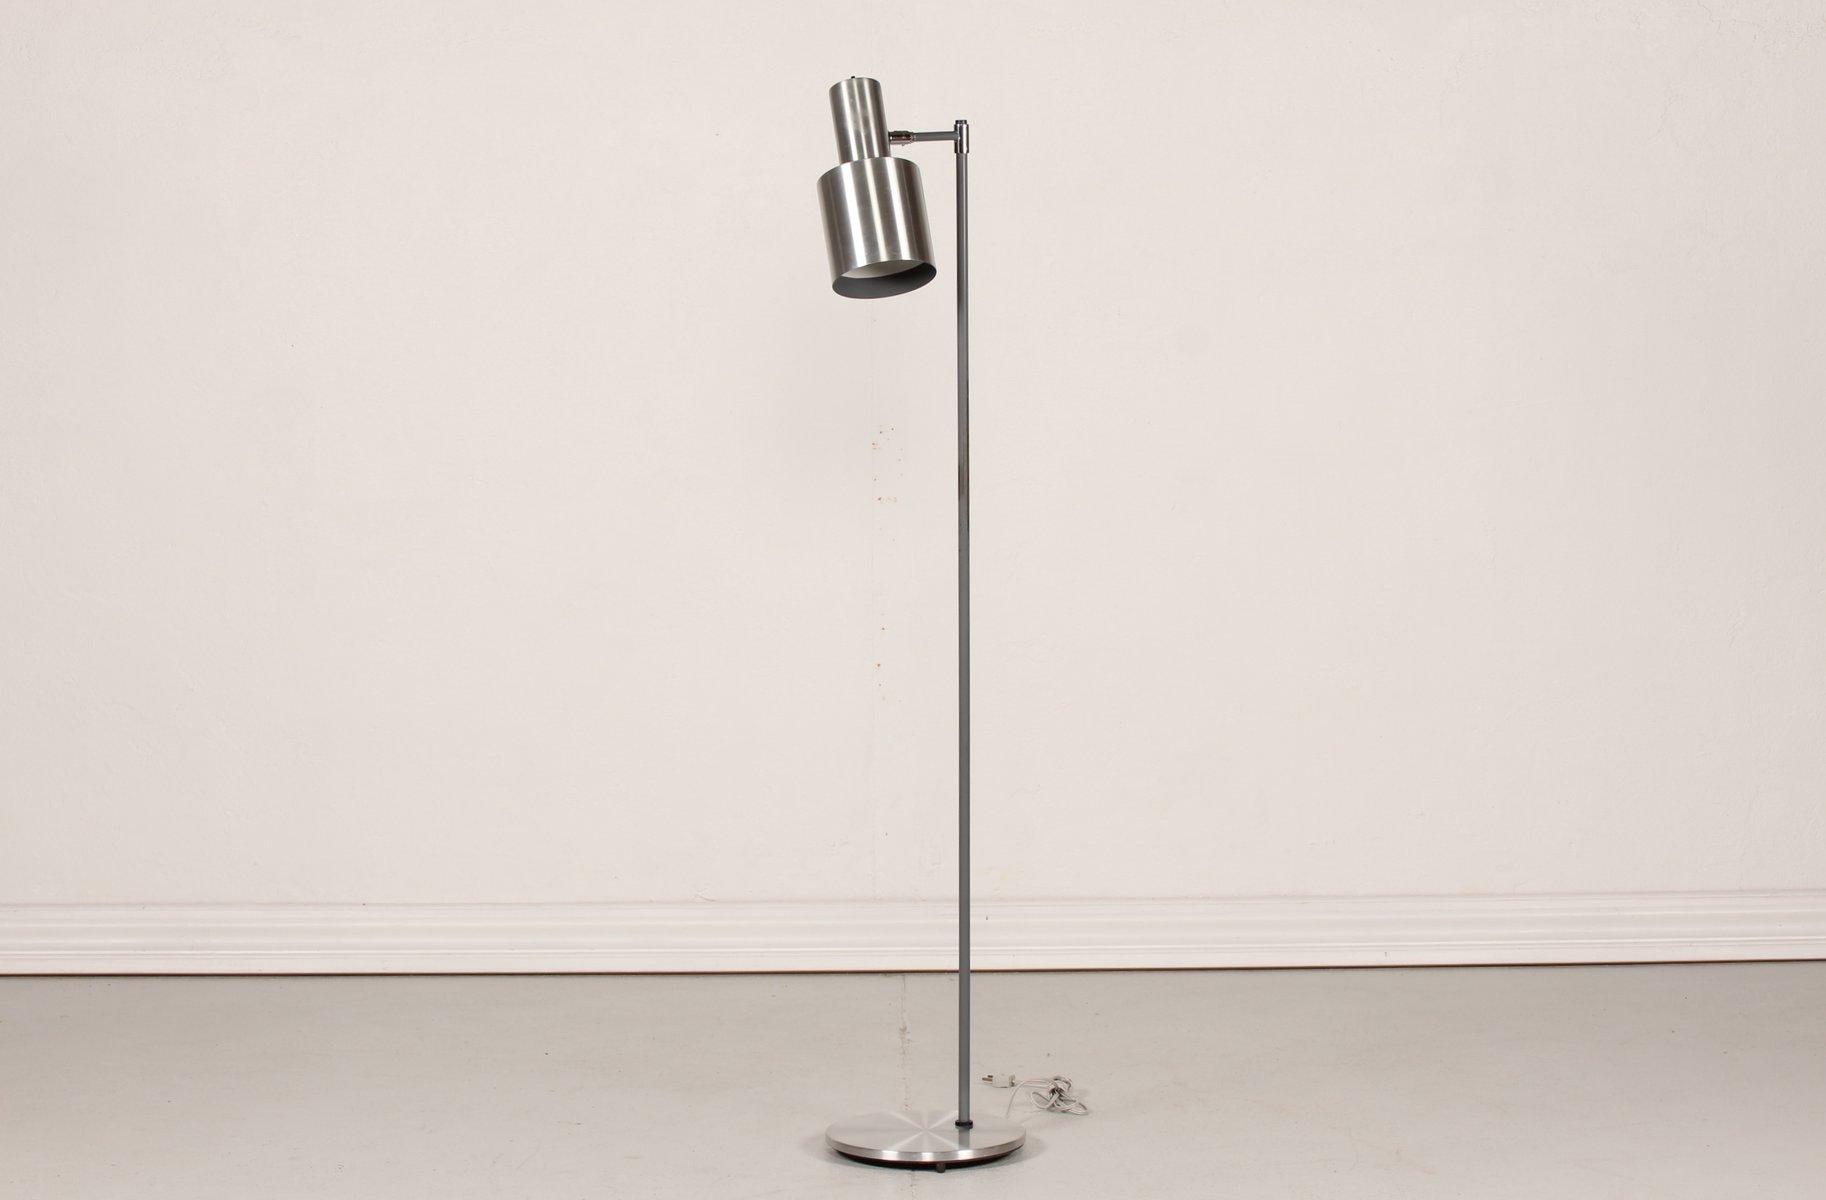 product floor dimensions diameter floors lersta reading height cord lamps pin base shade length lamp ikea